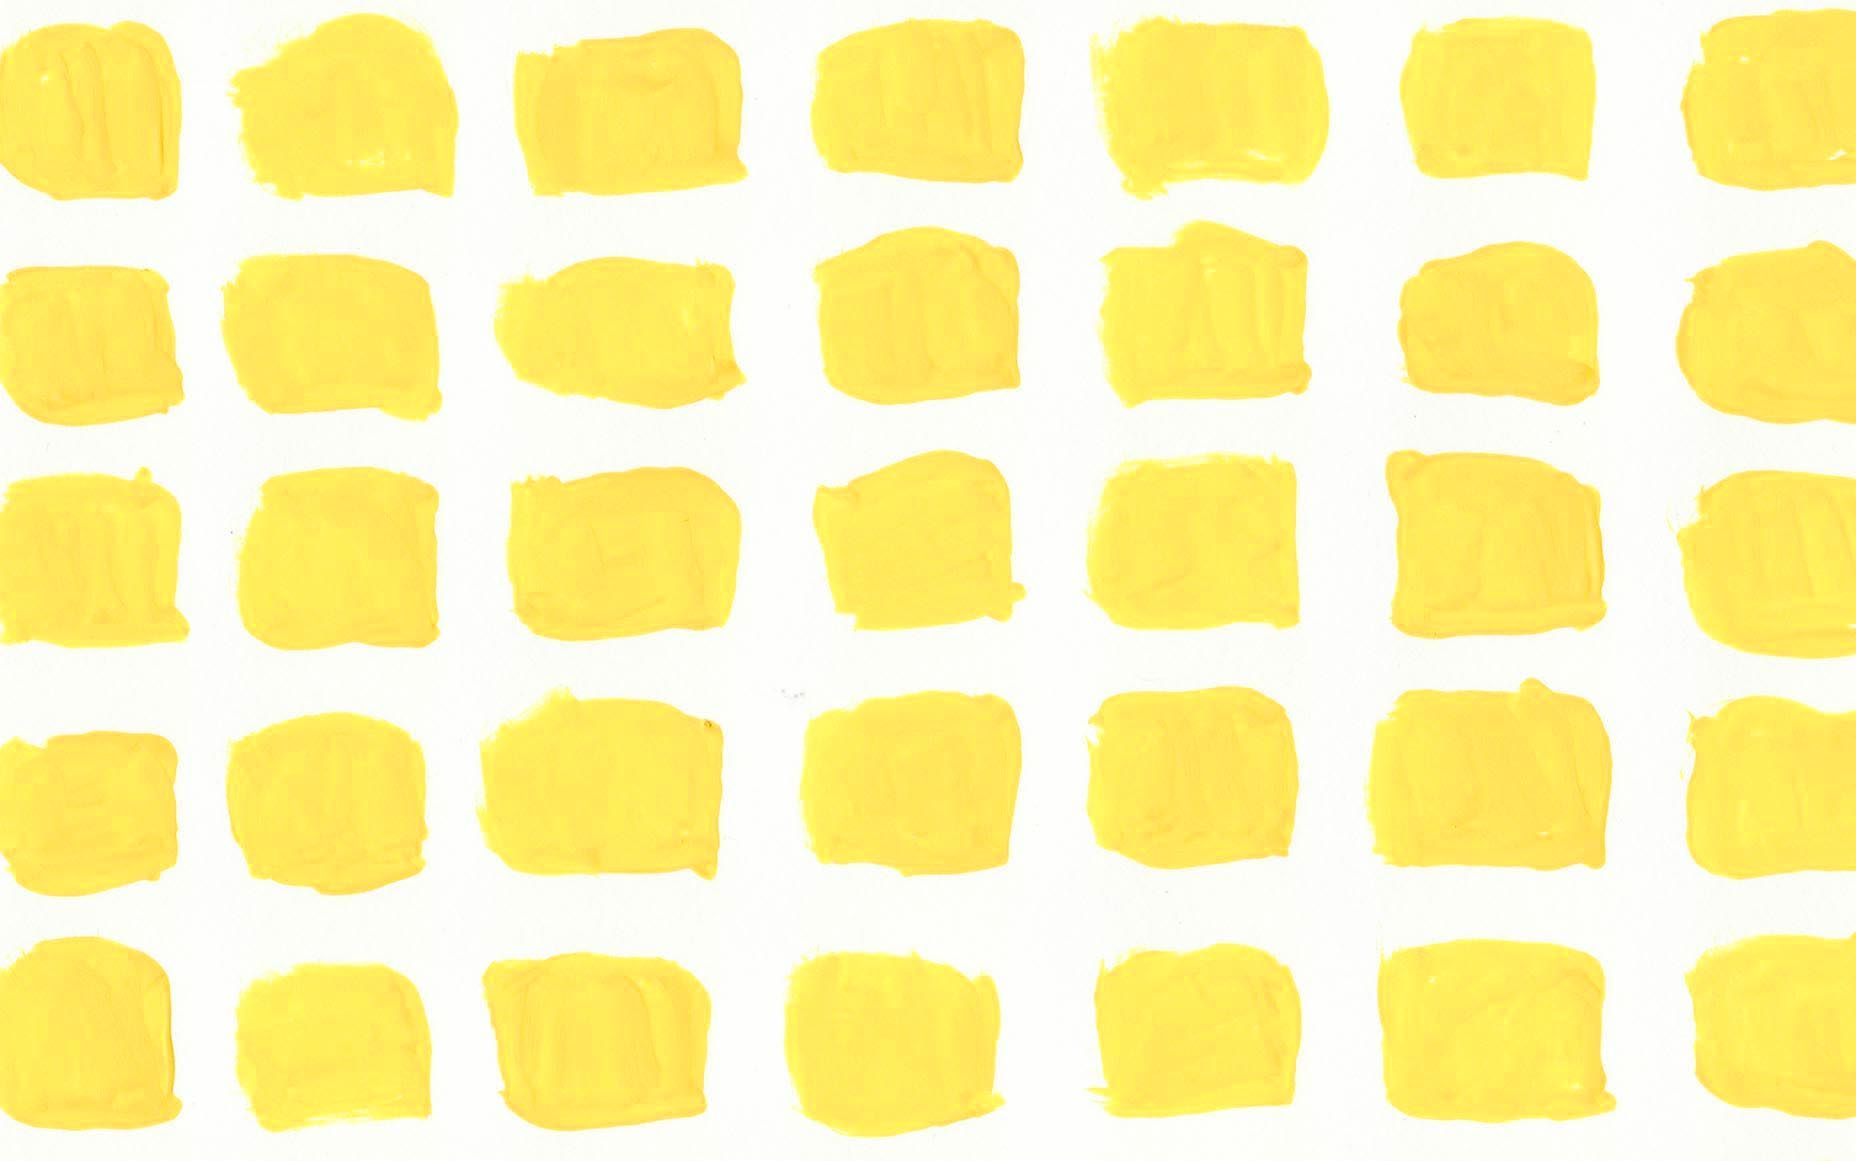 Yellow Blocks Desktop Background Jpg 1 856 1 161 Pixels Yellow Aesthetic Dress Your Tech Yellow Aesthetic Pastel